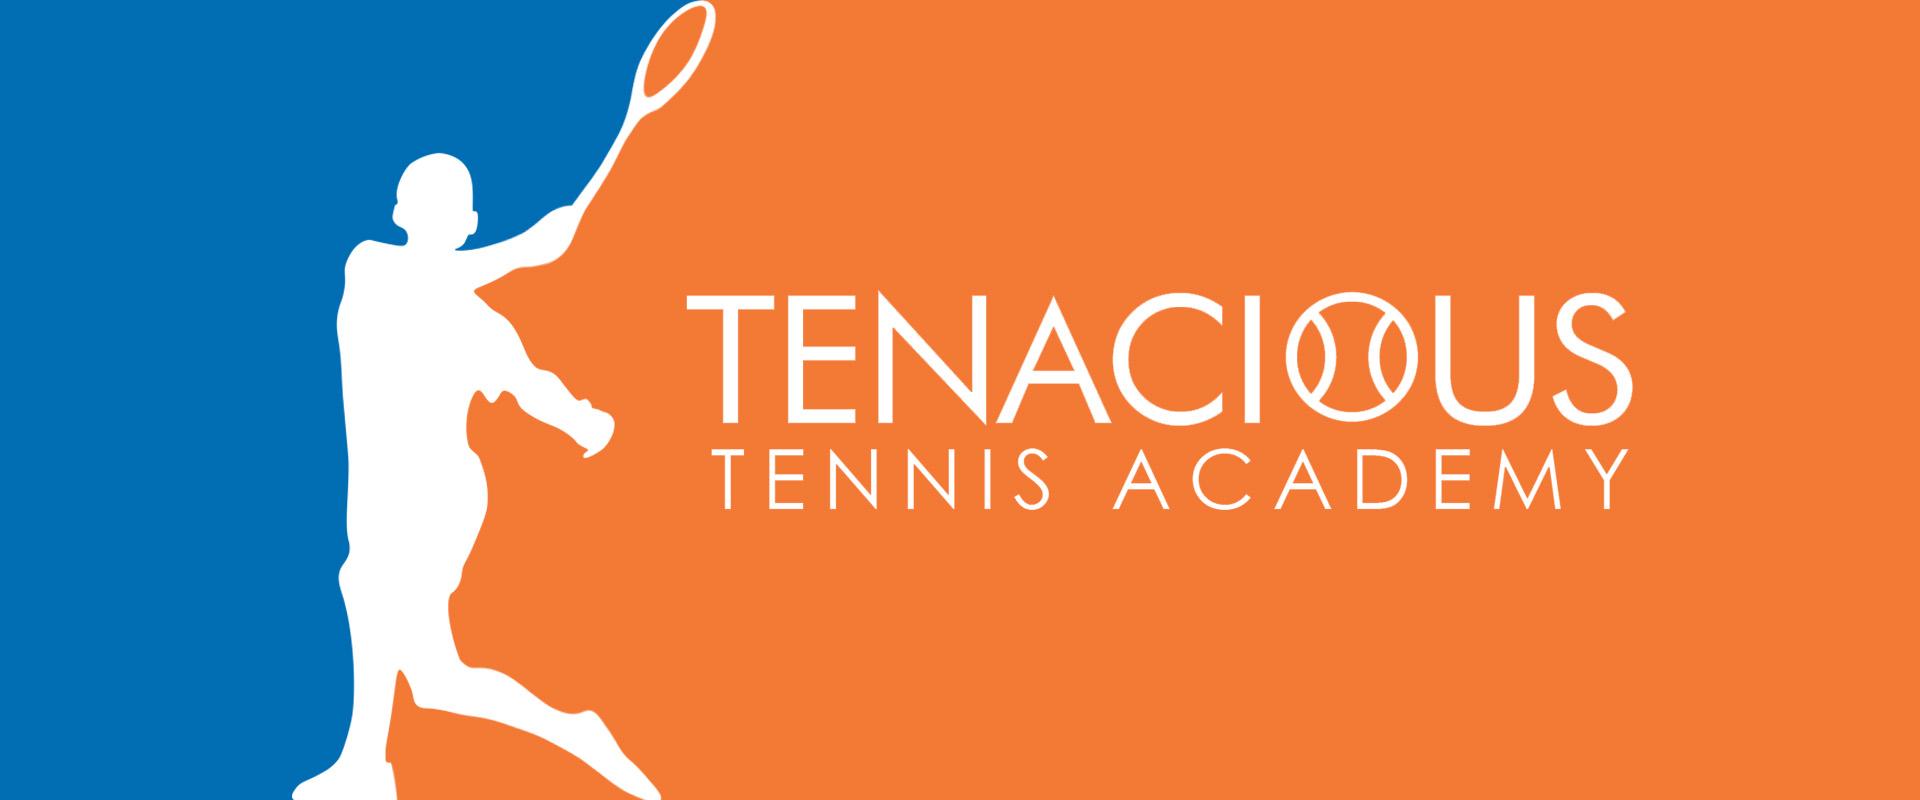 Tenacious Tennis Academy